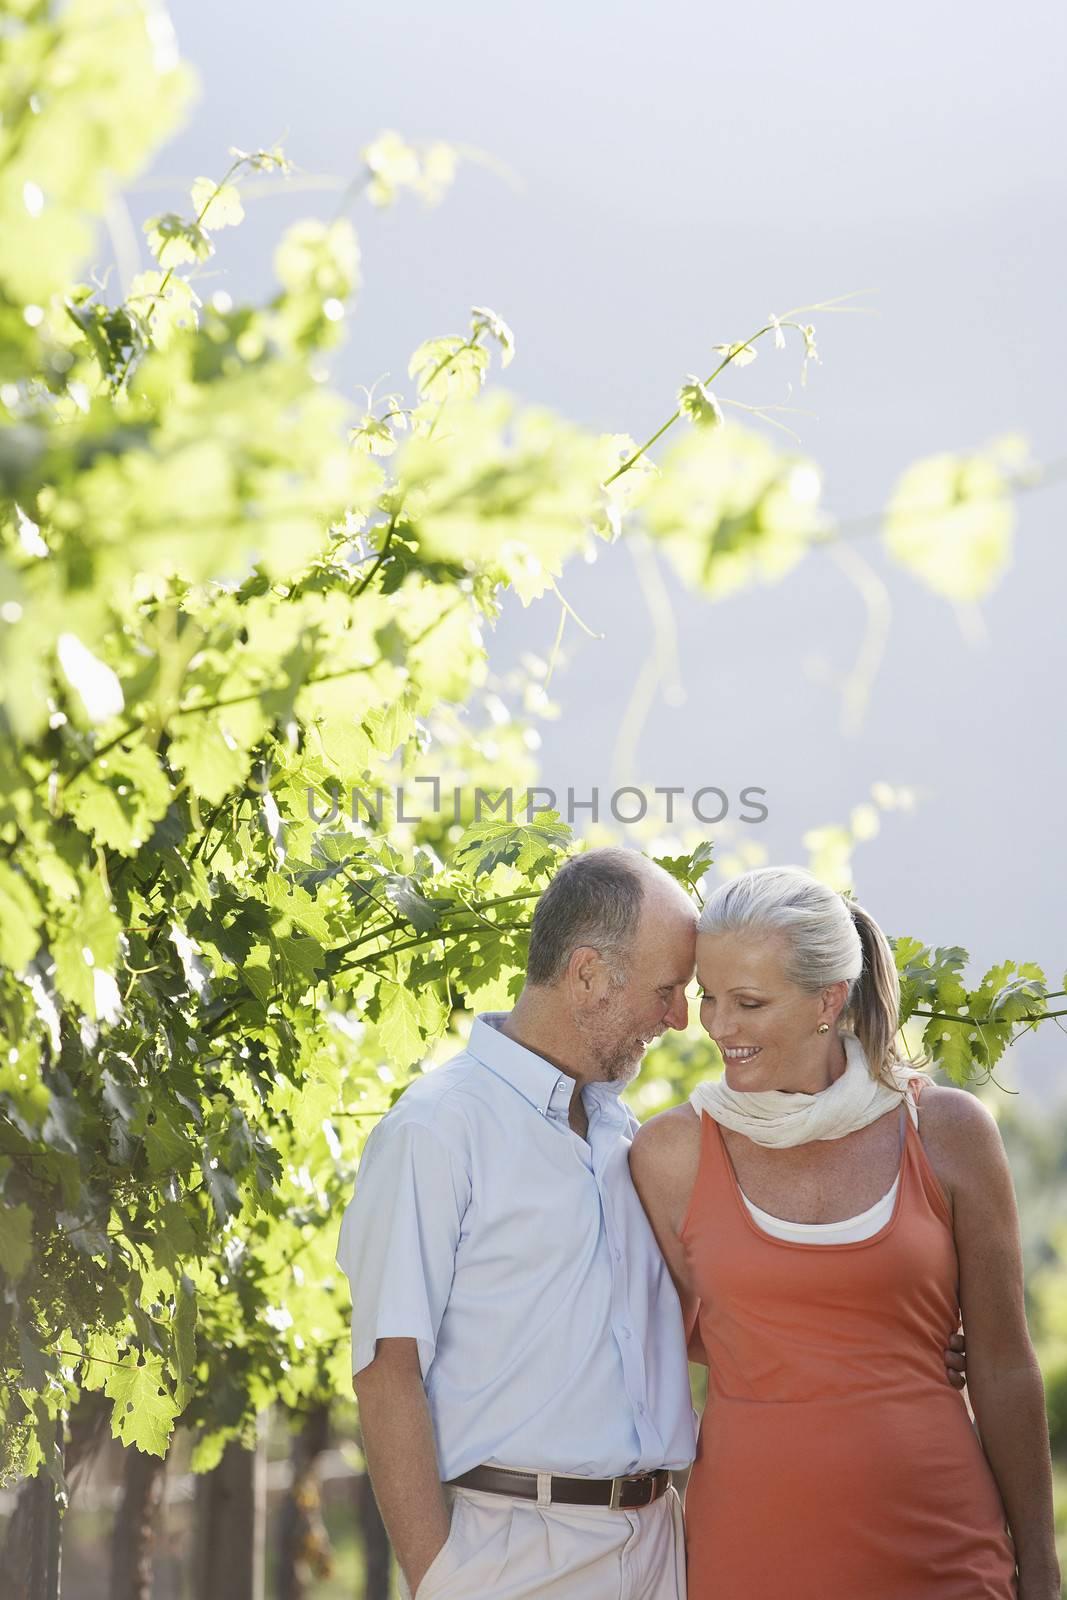 Romantic Couple In Vineyard